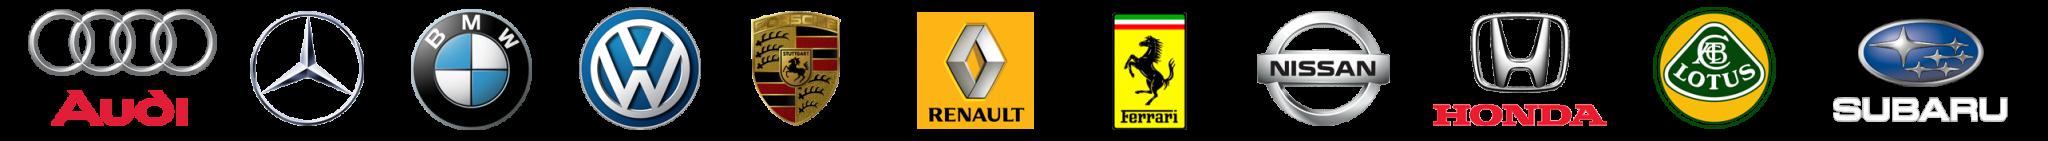 ukauto mandataire angleterre voiture occasion voiture anglaise import auto ukauto - Contactez Ukauto pour importer votre prochain véhicule depuis l'Angleterre.